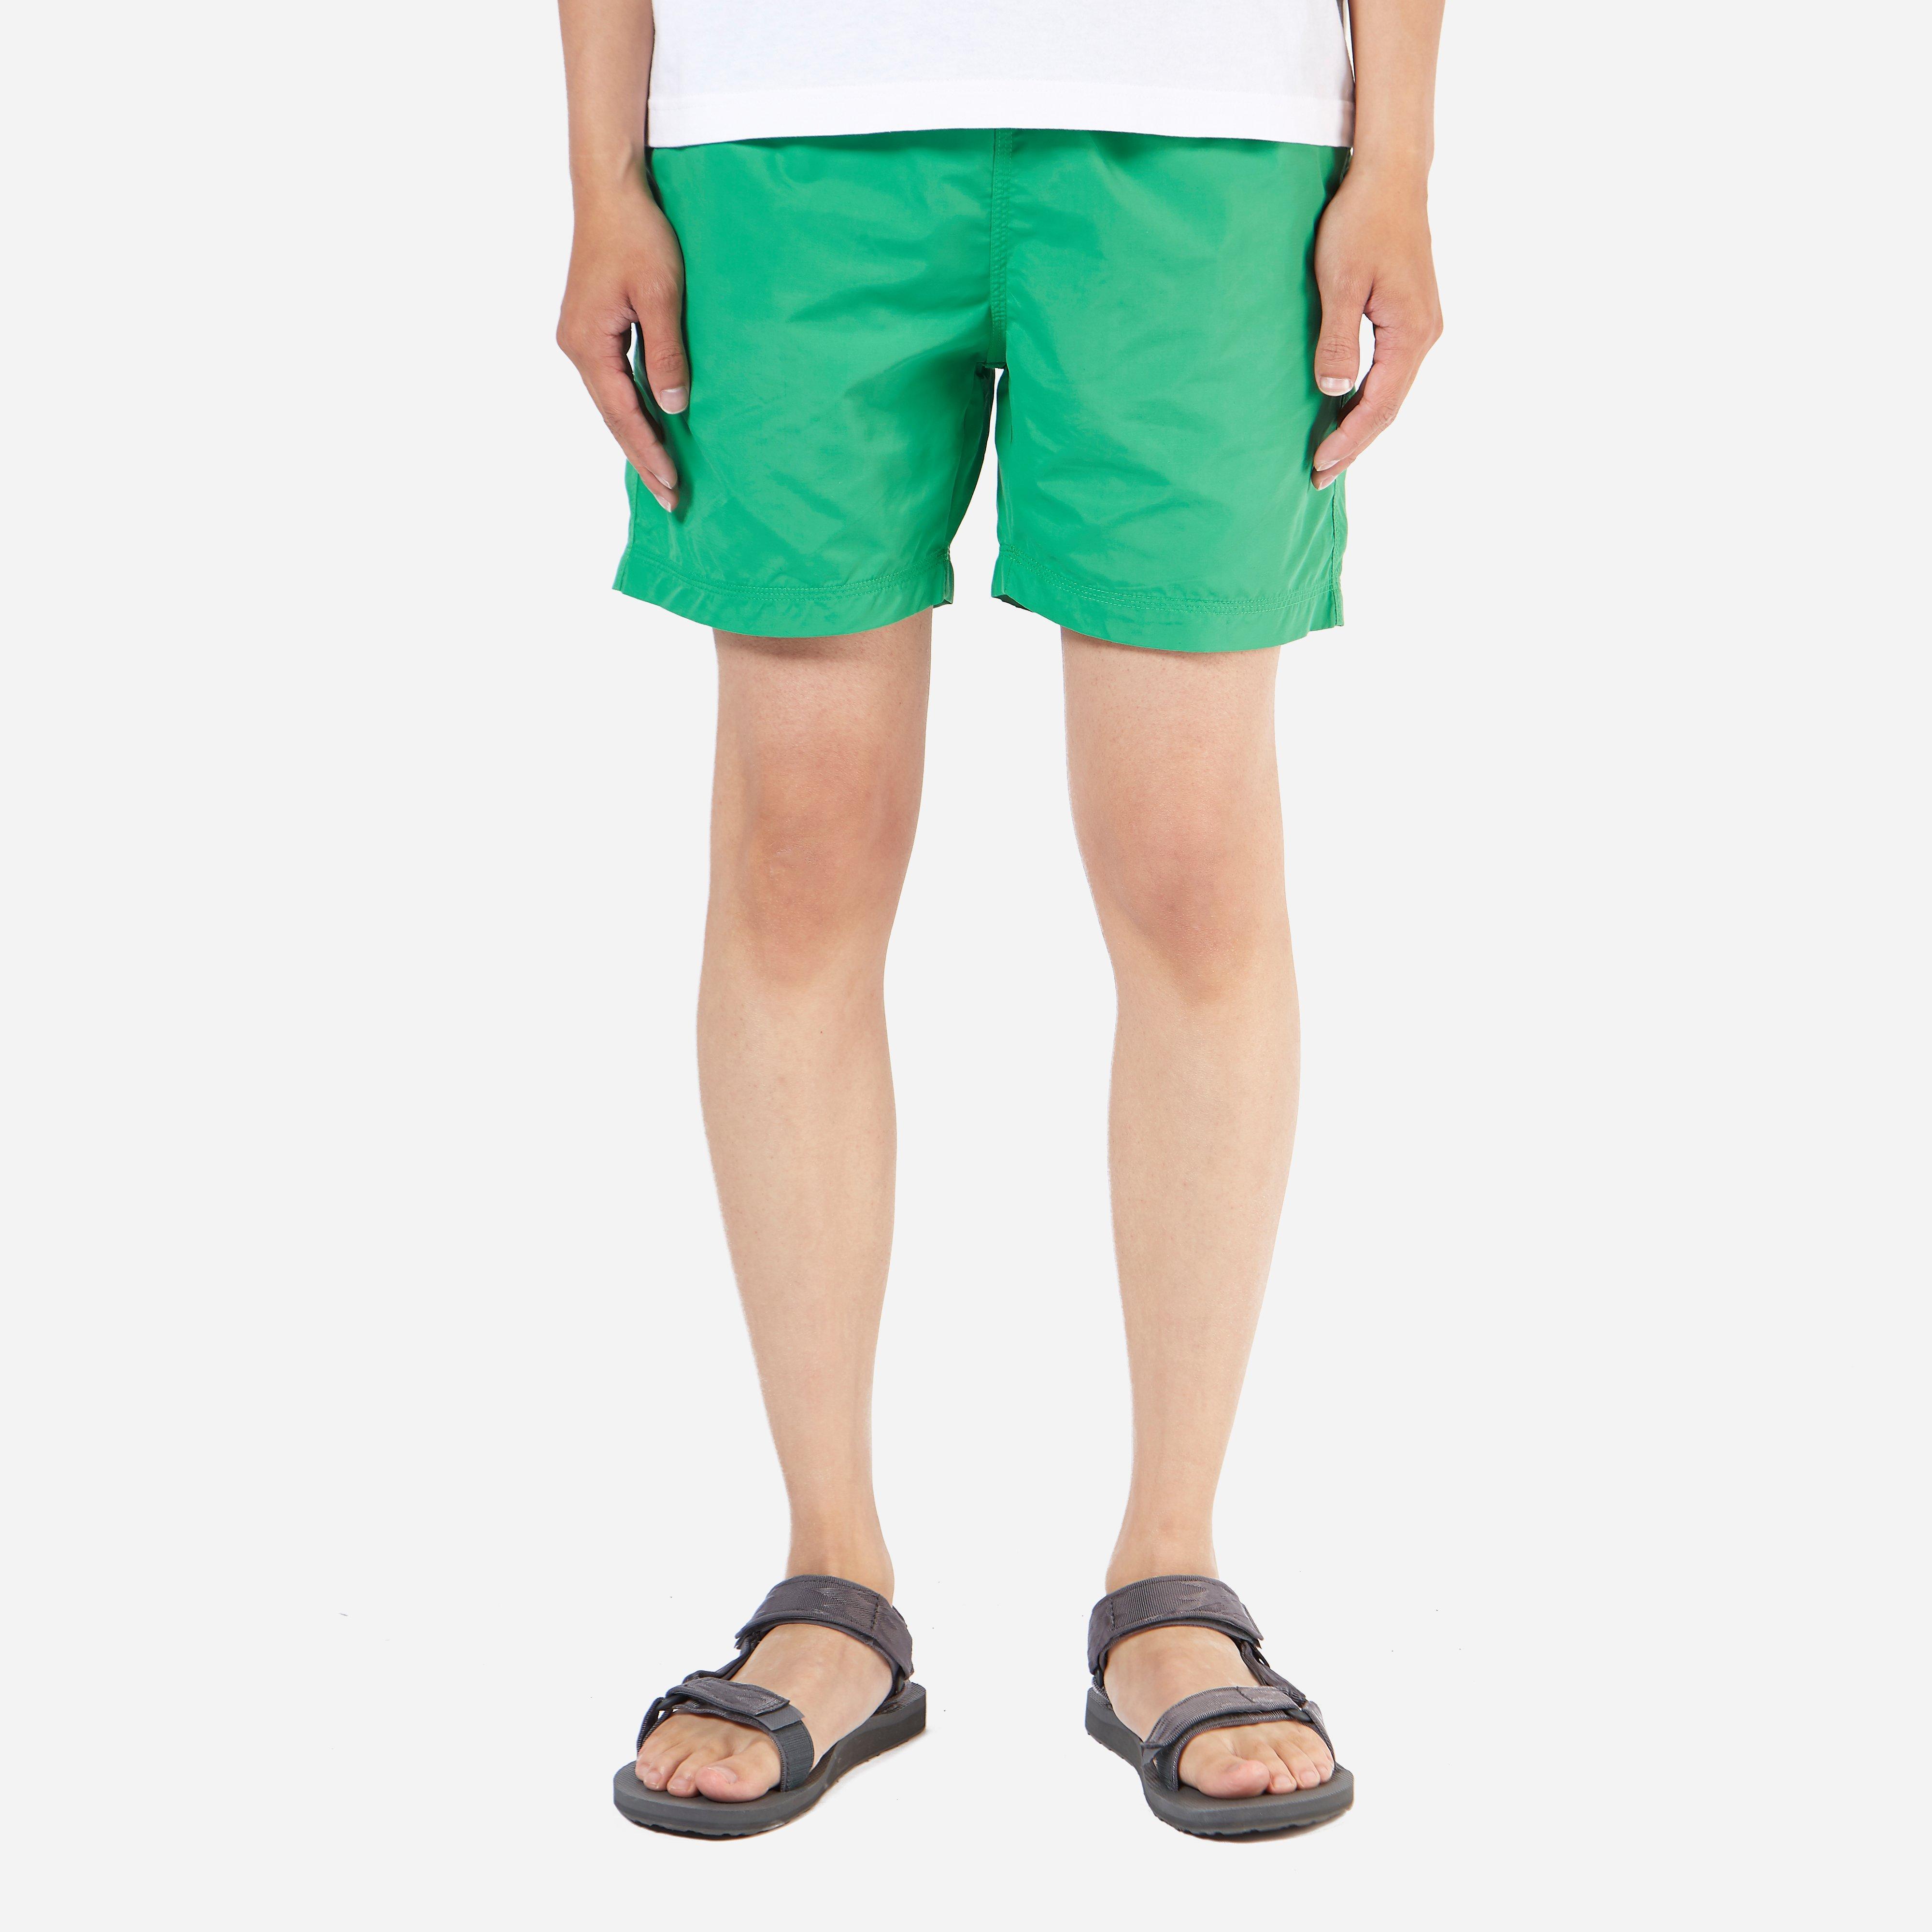 b50e471a924f5 Lyst - Carhartt WIP Drift Swim Shorts in Green for Men